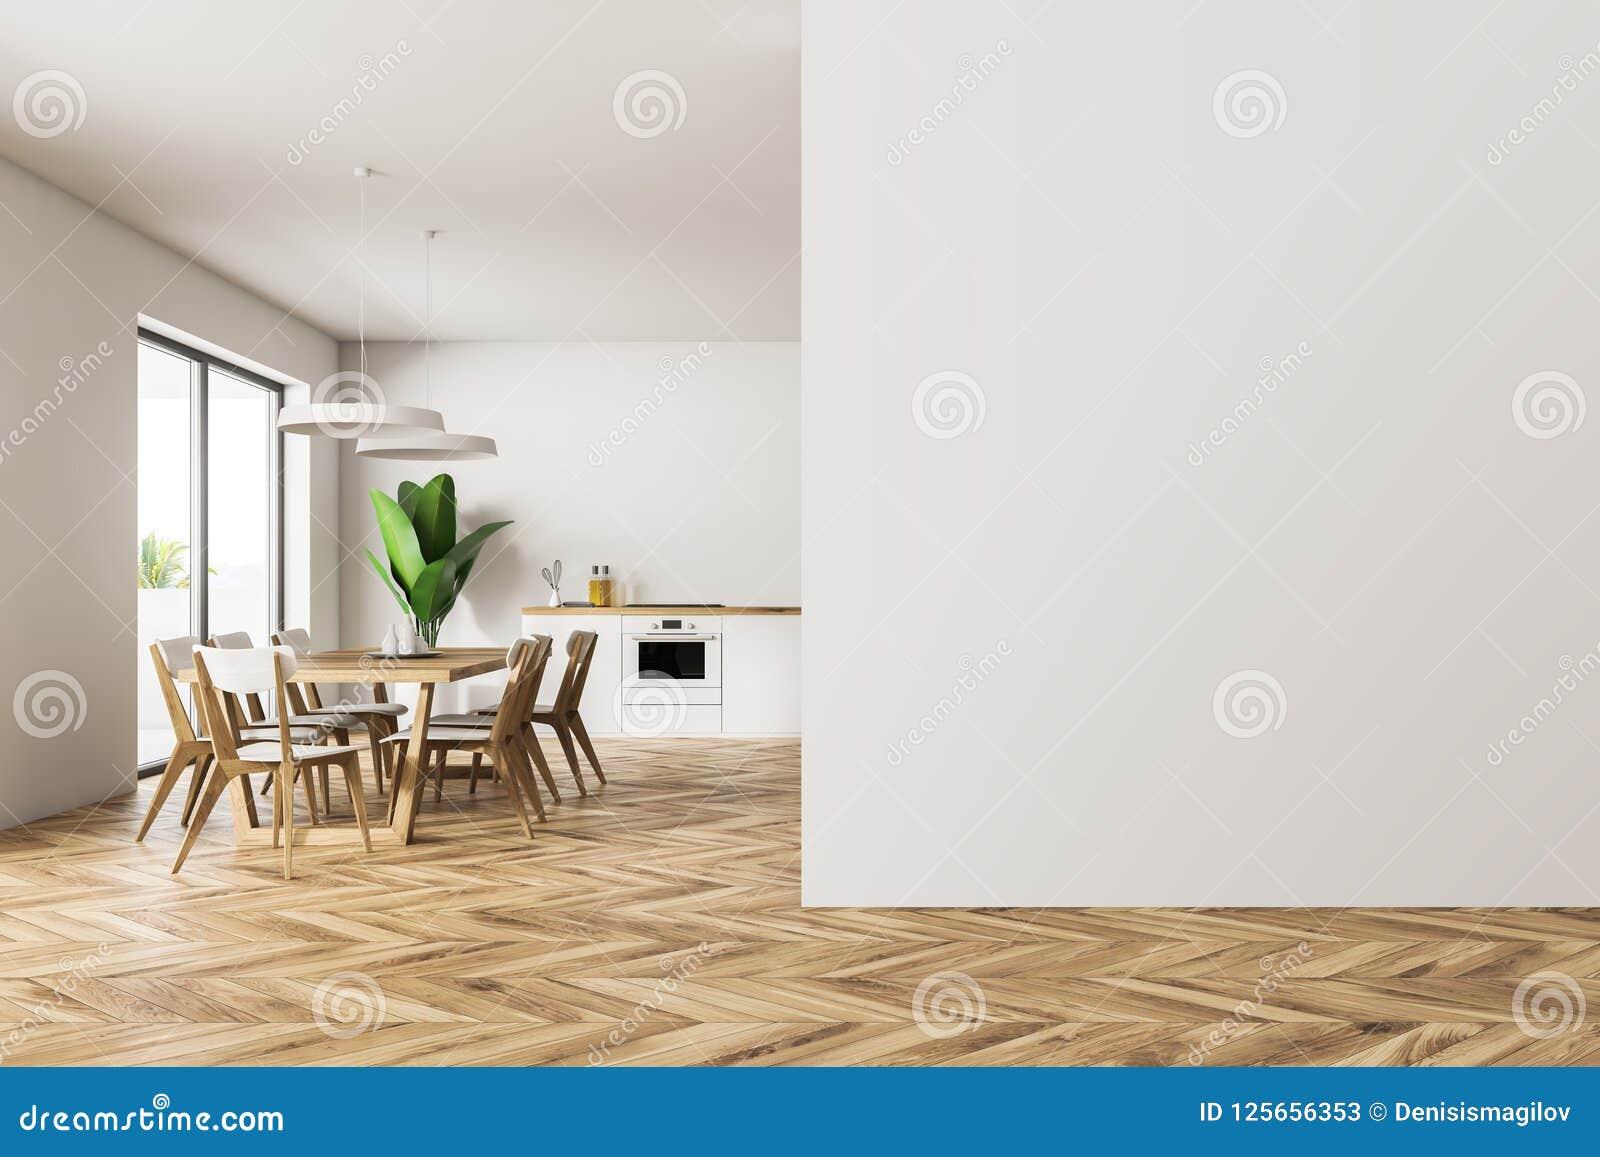 Cuisine Blanche Et Salle A Manger Interieures Mur Vide